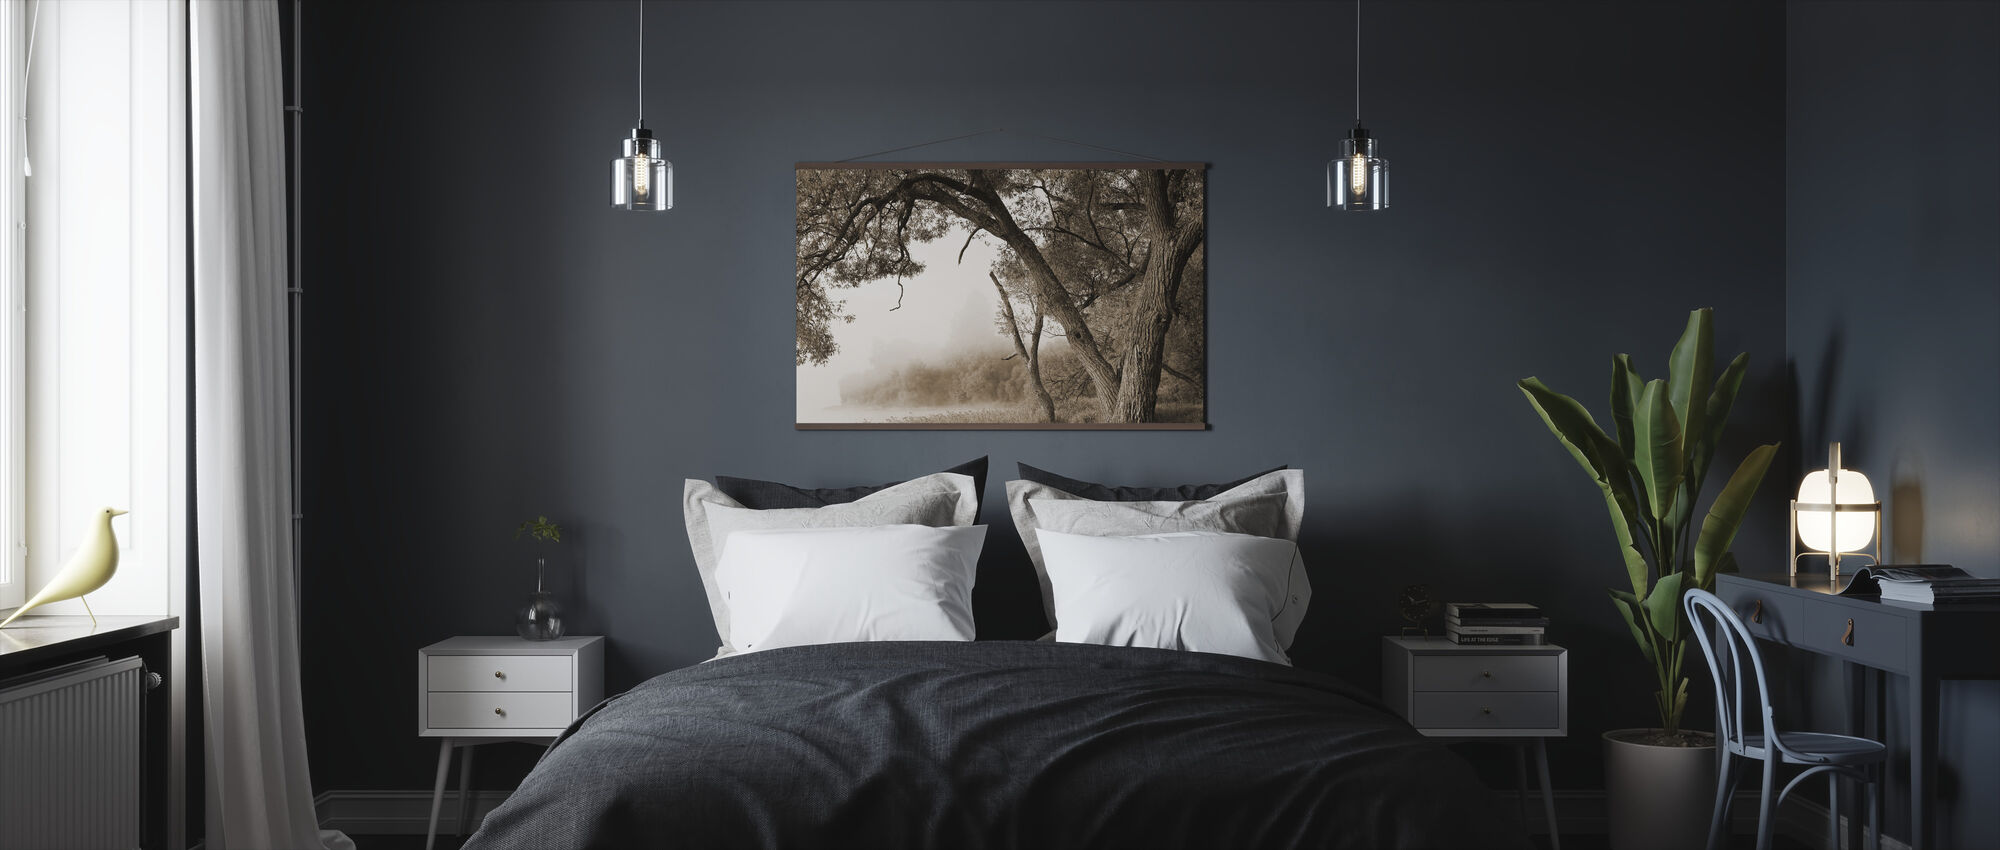 Puu sumussa - Juliste - Makuuhuone